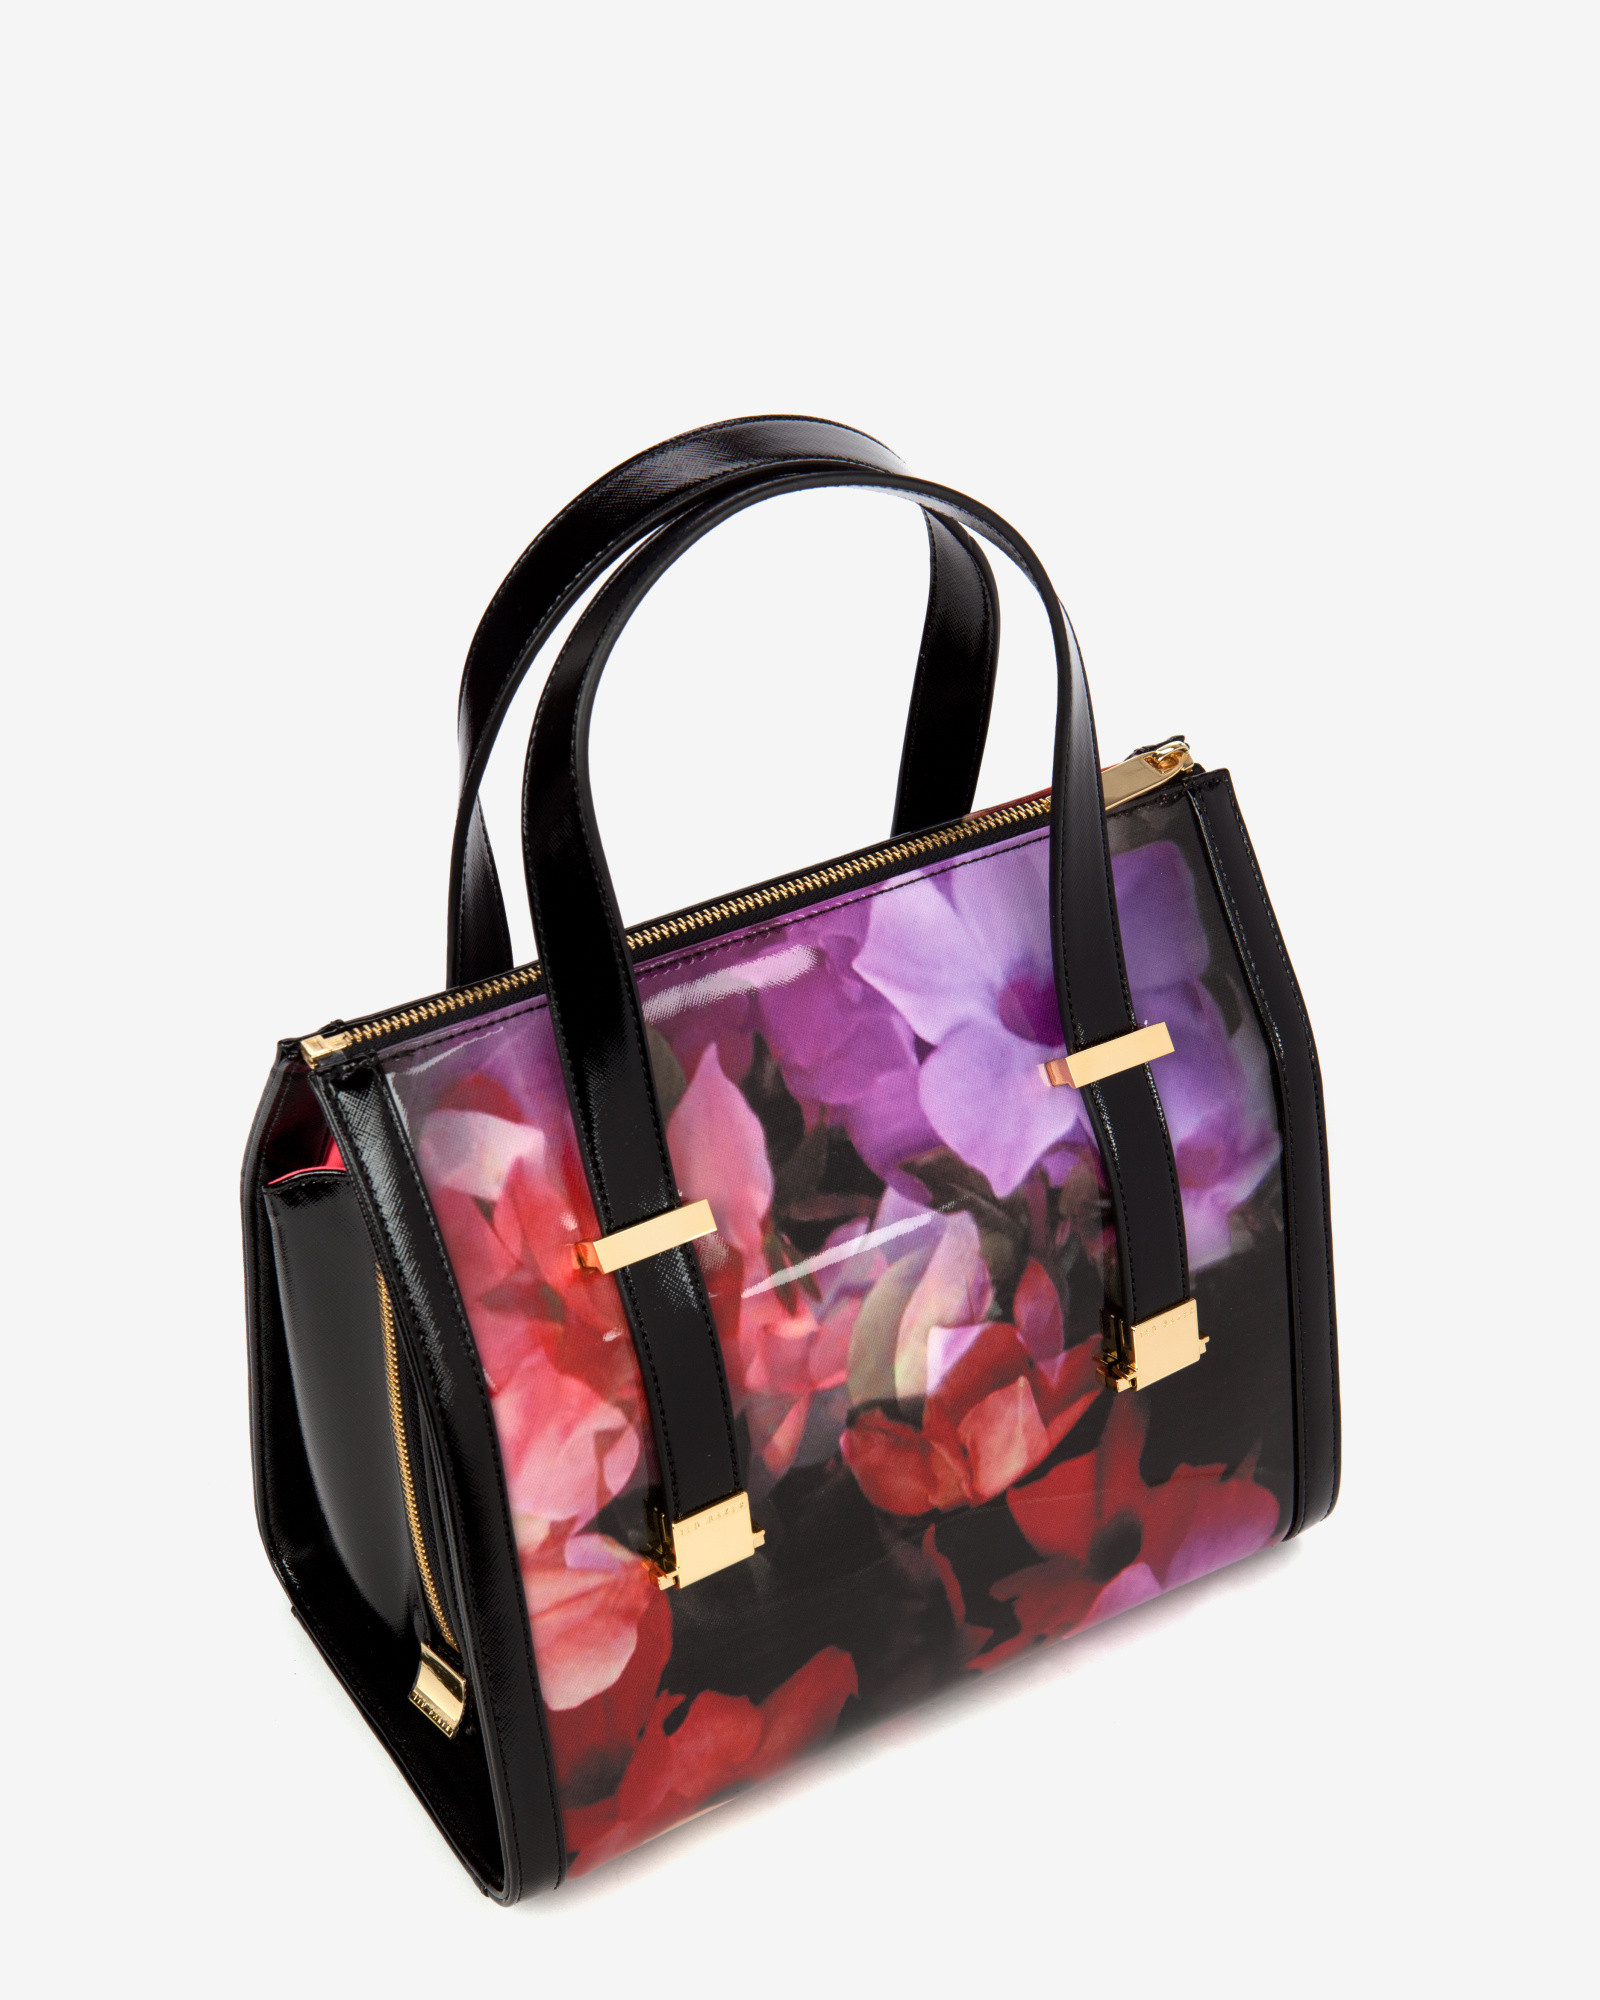 d988be2ee1c54 Lyst - Ted Baker Cascading Floral Bowler Bag in Black